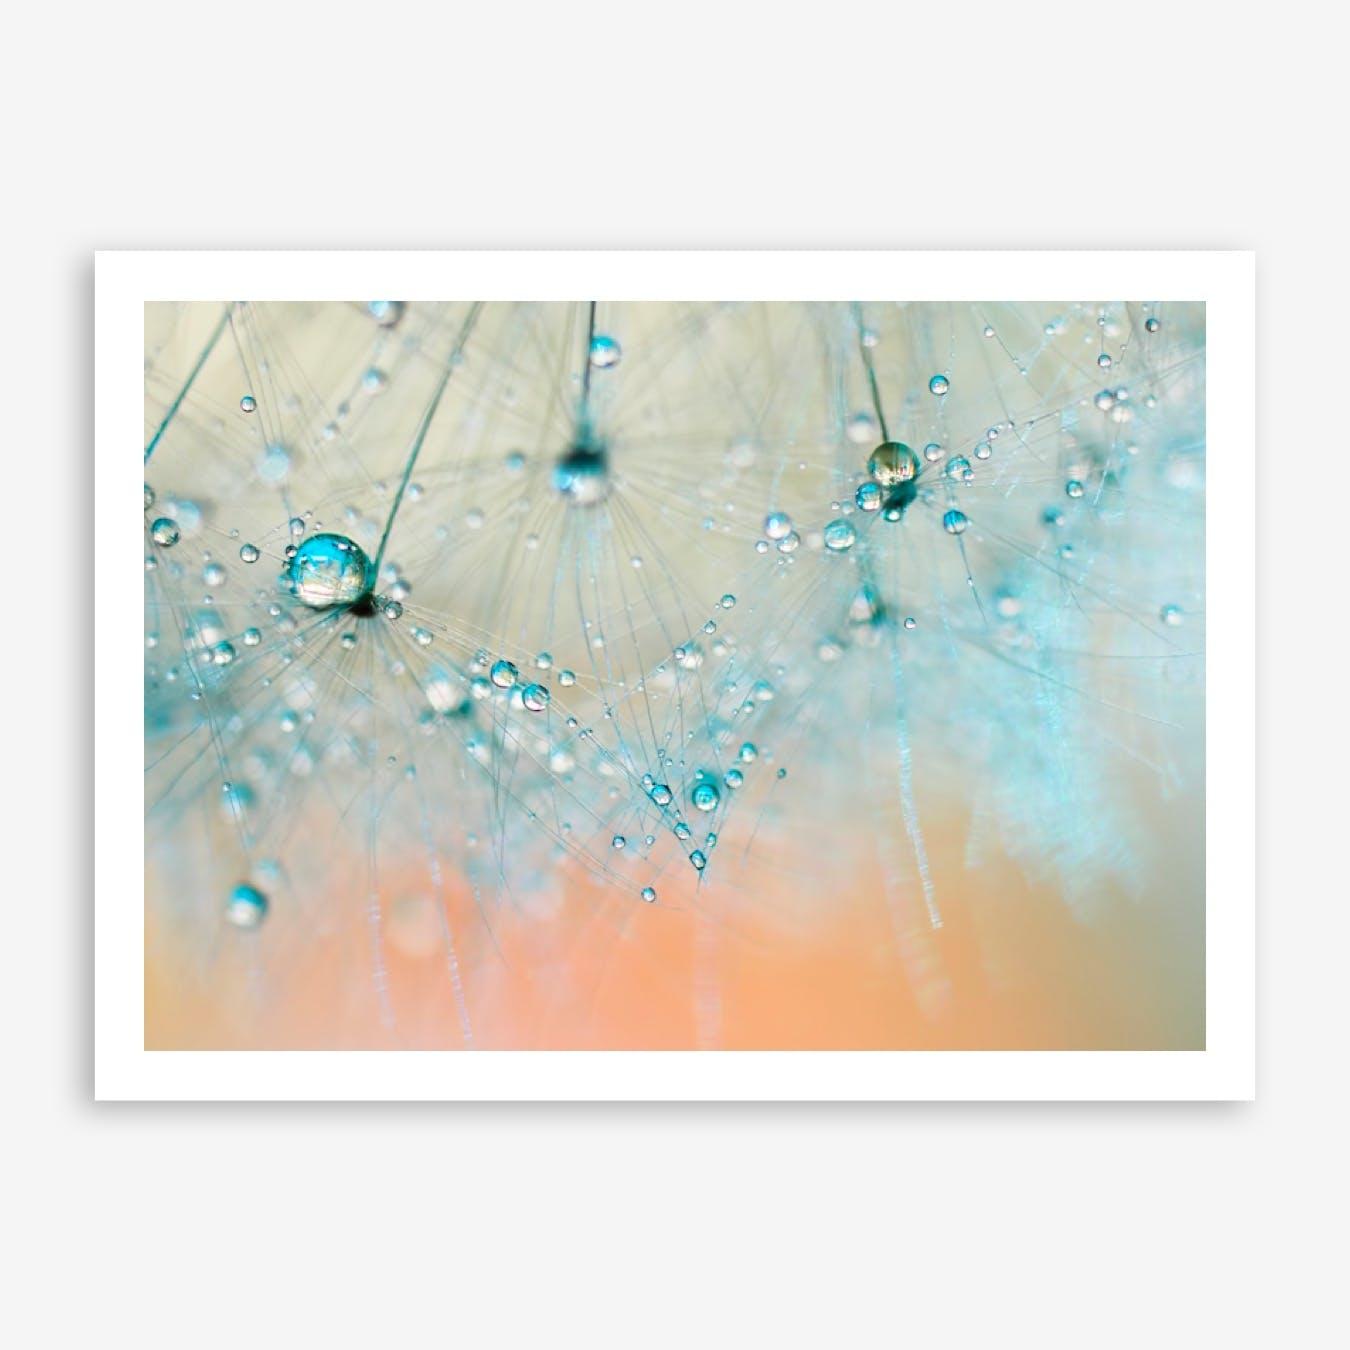 Dandelion -Droplets of Aqua